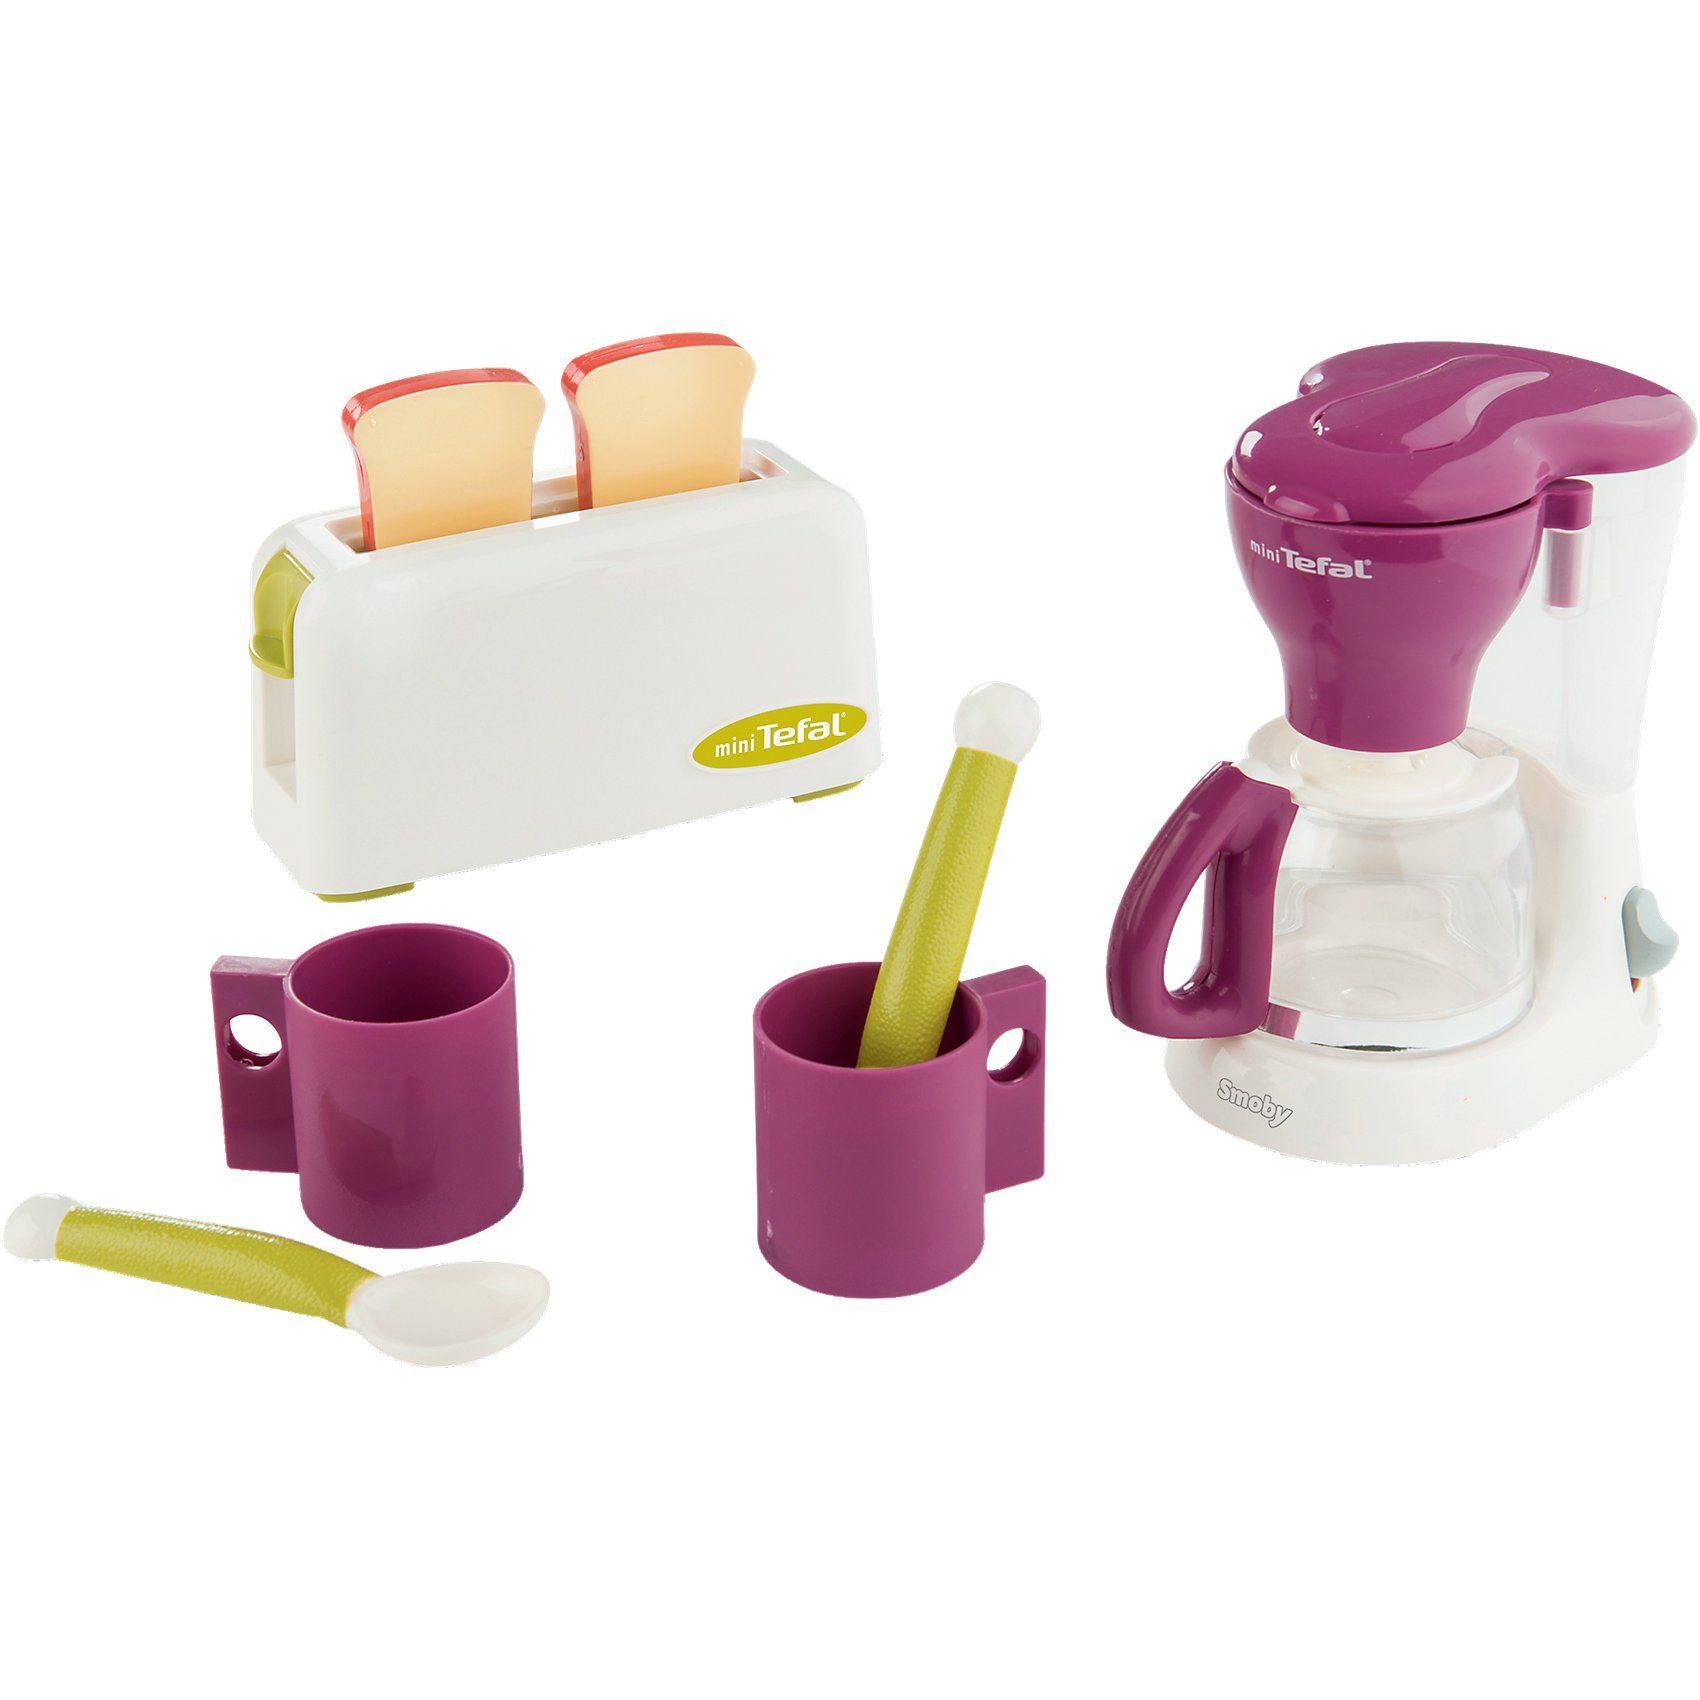 Smoby Tefal Frühstücksset mit Kaffeemaschine Küchengerät